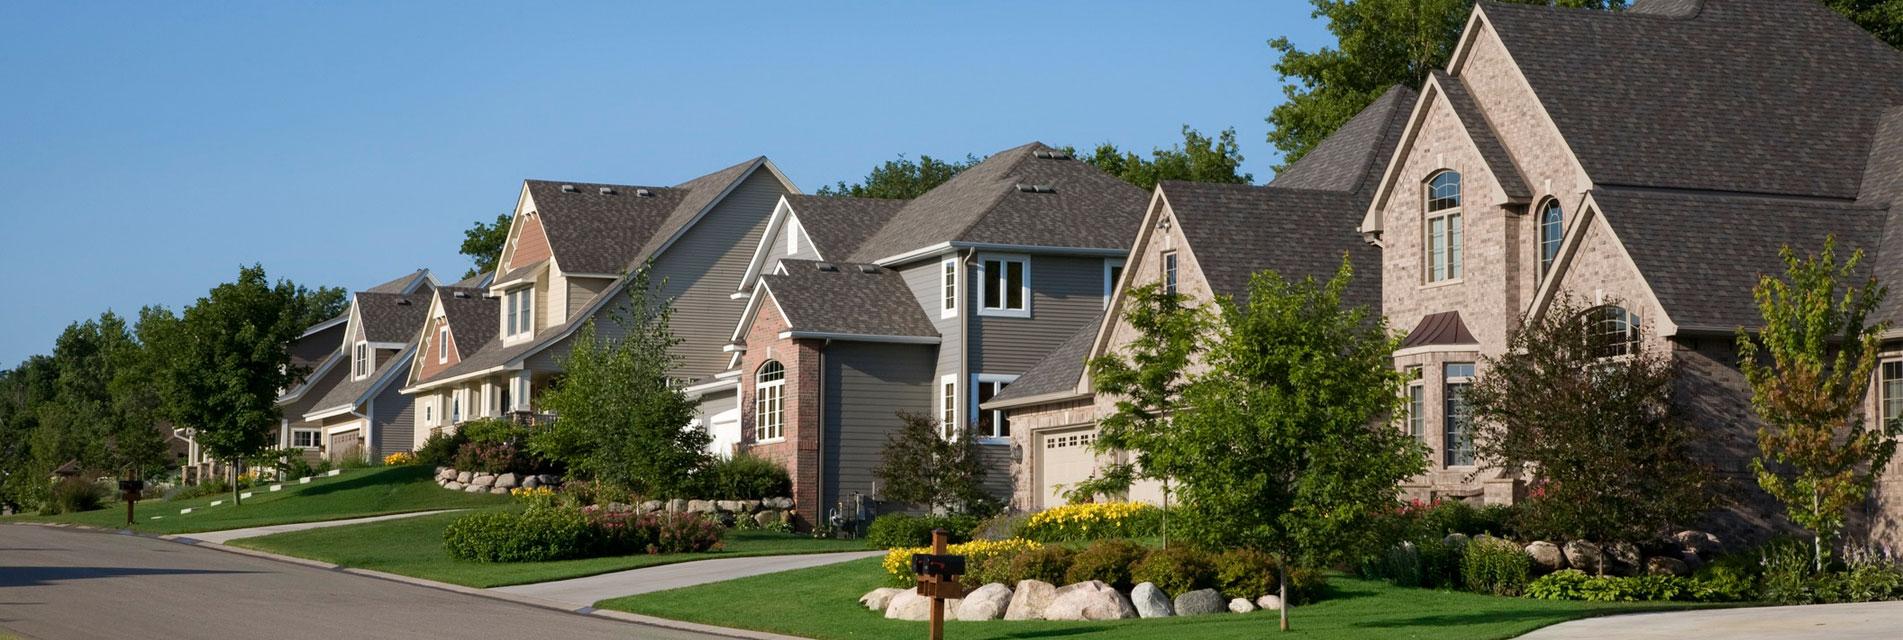 RE/MAX One - Missouri Real Estate